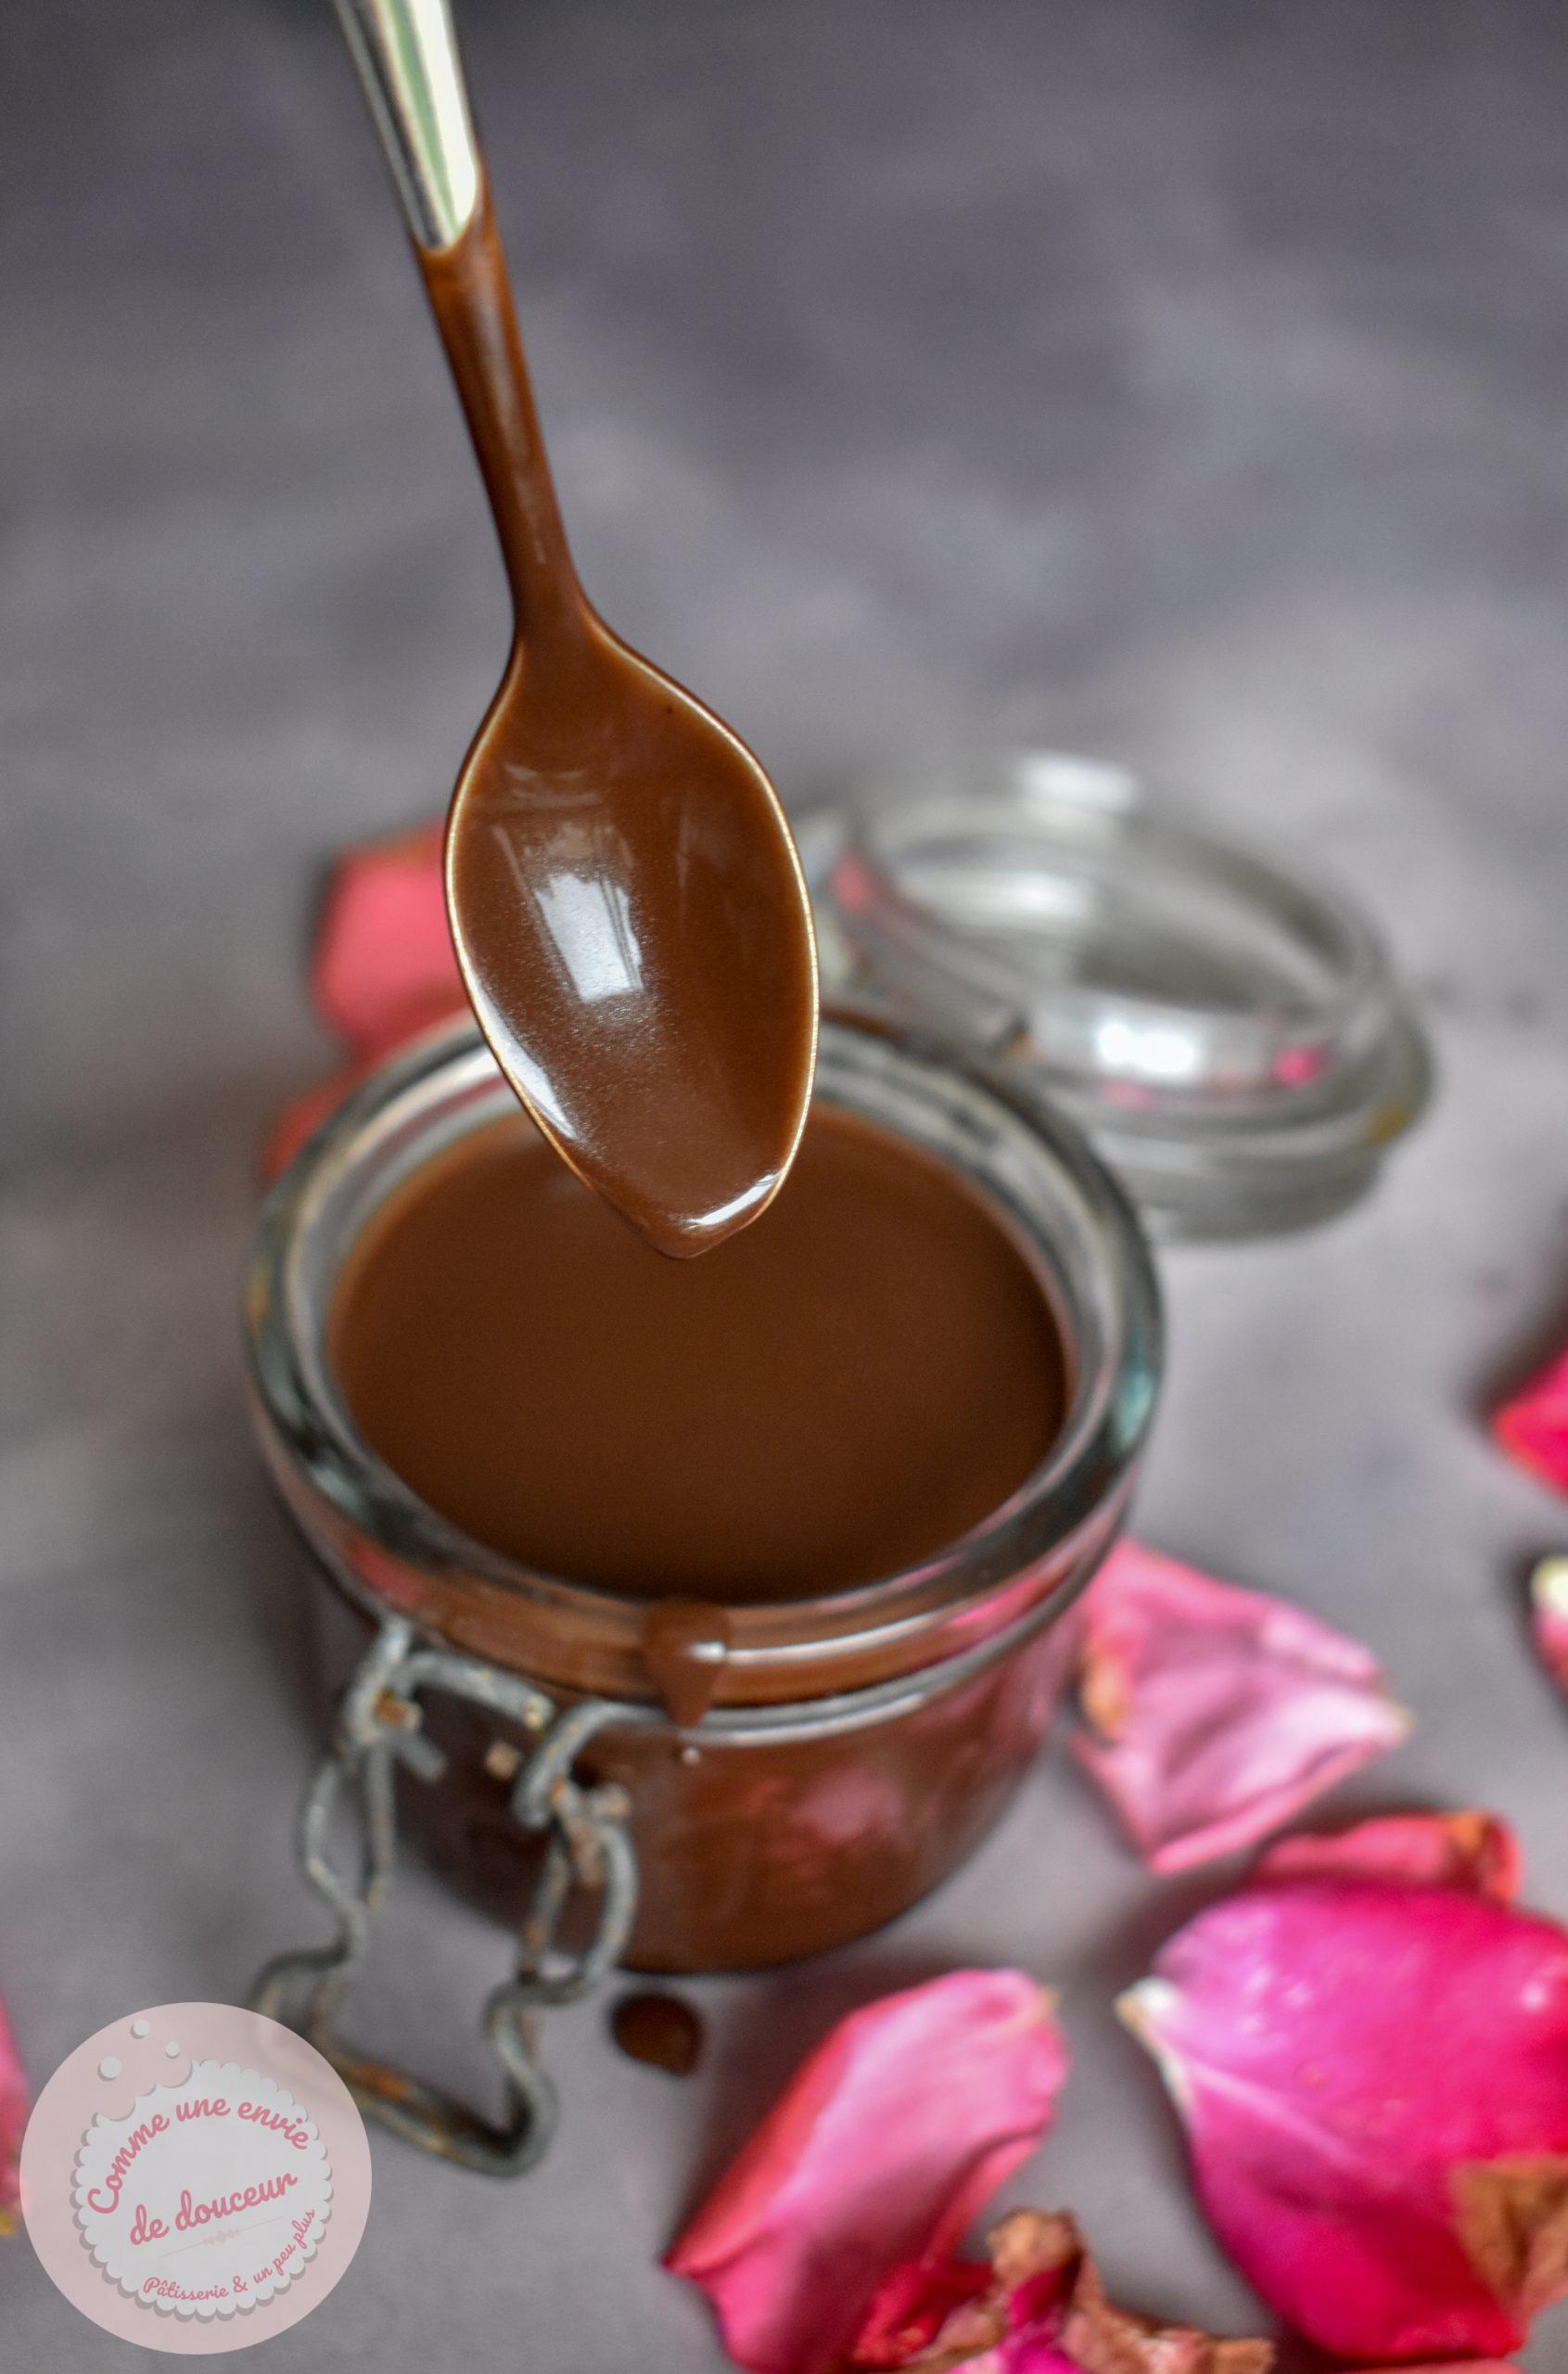 mousse menthe coulis chocolat